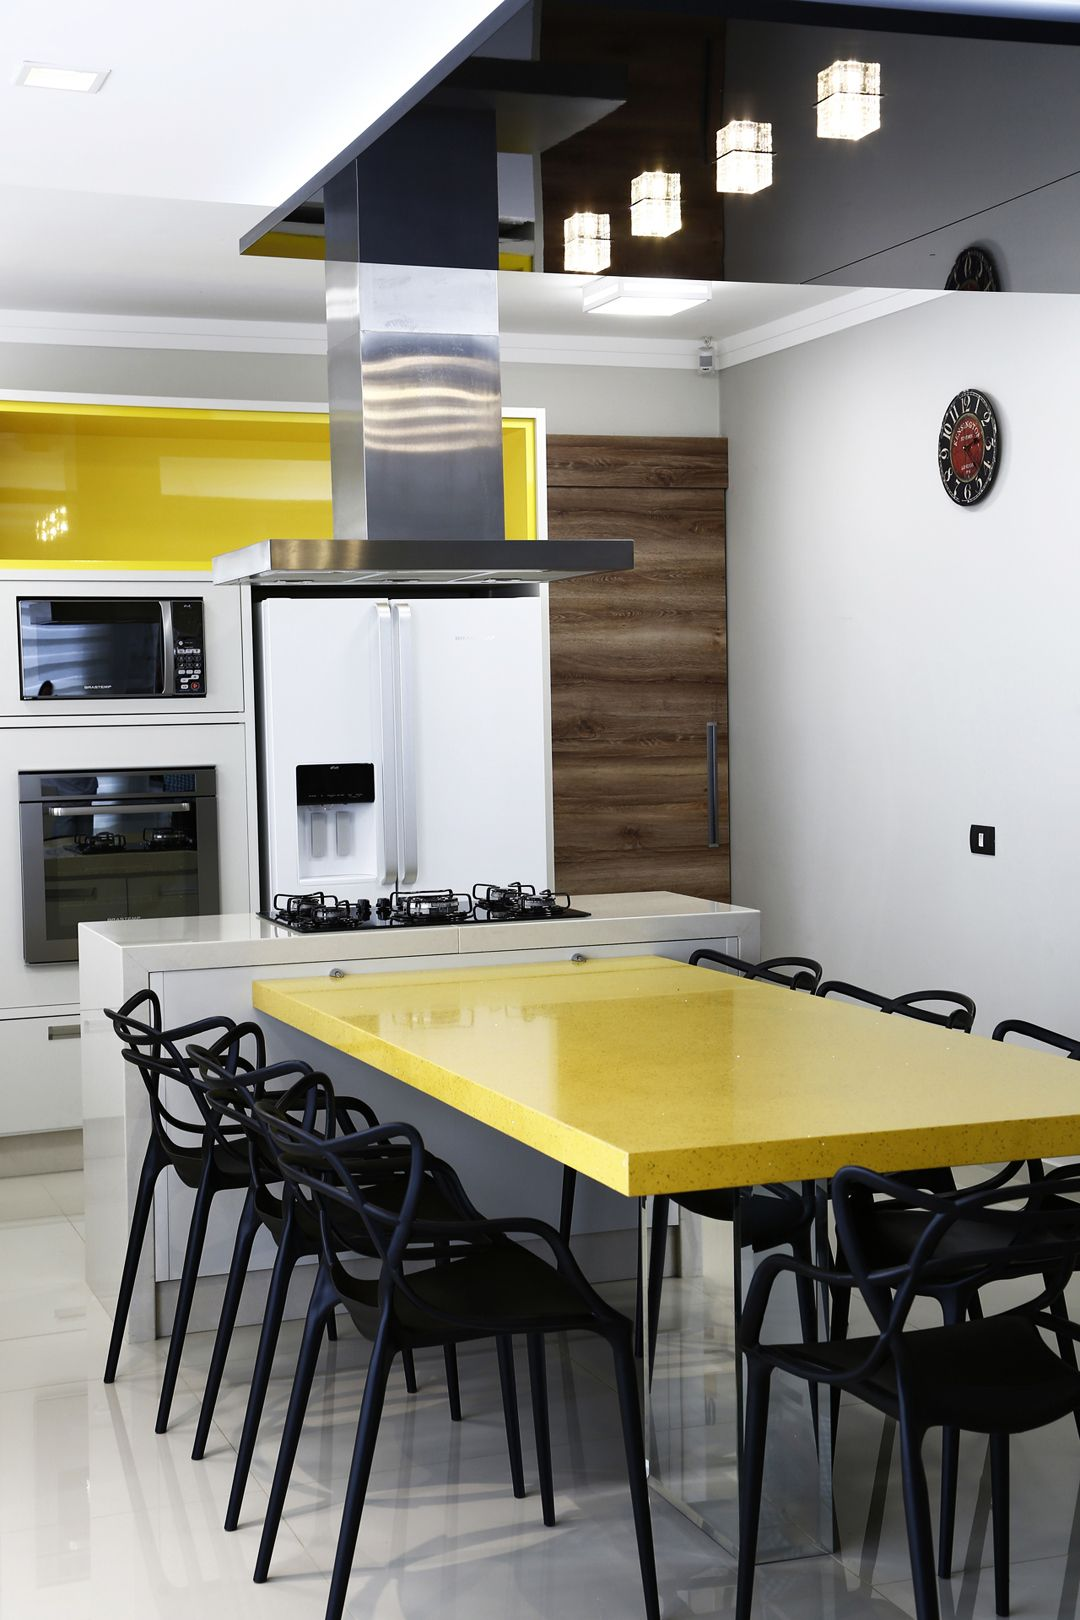 Cozinha kashmir nicho citrino mesa silestone amarelo stellar cozinhas pinterest - Mesa de silestone ...